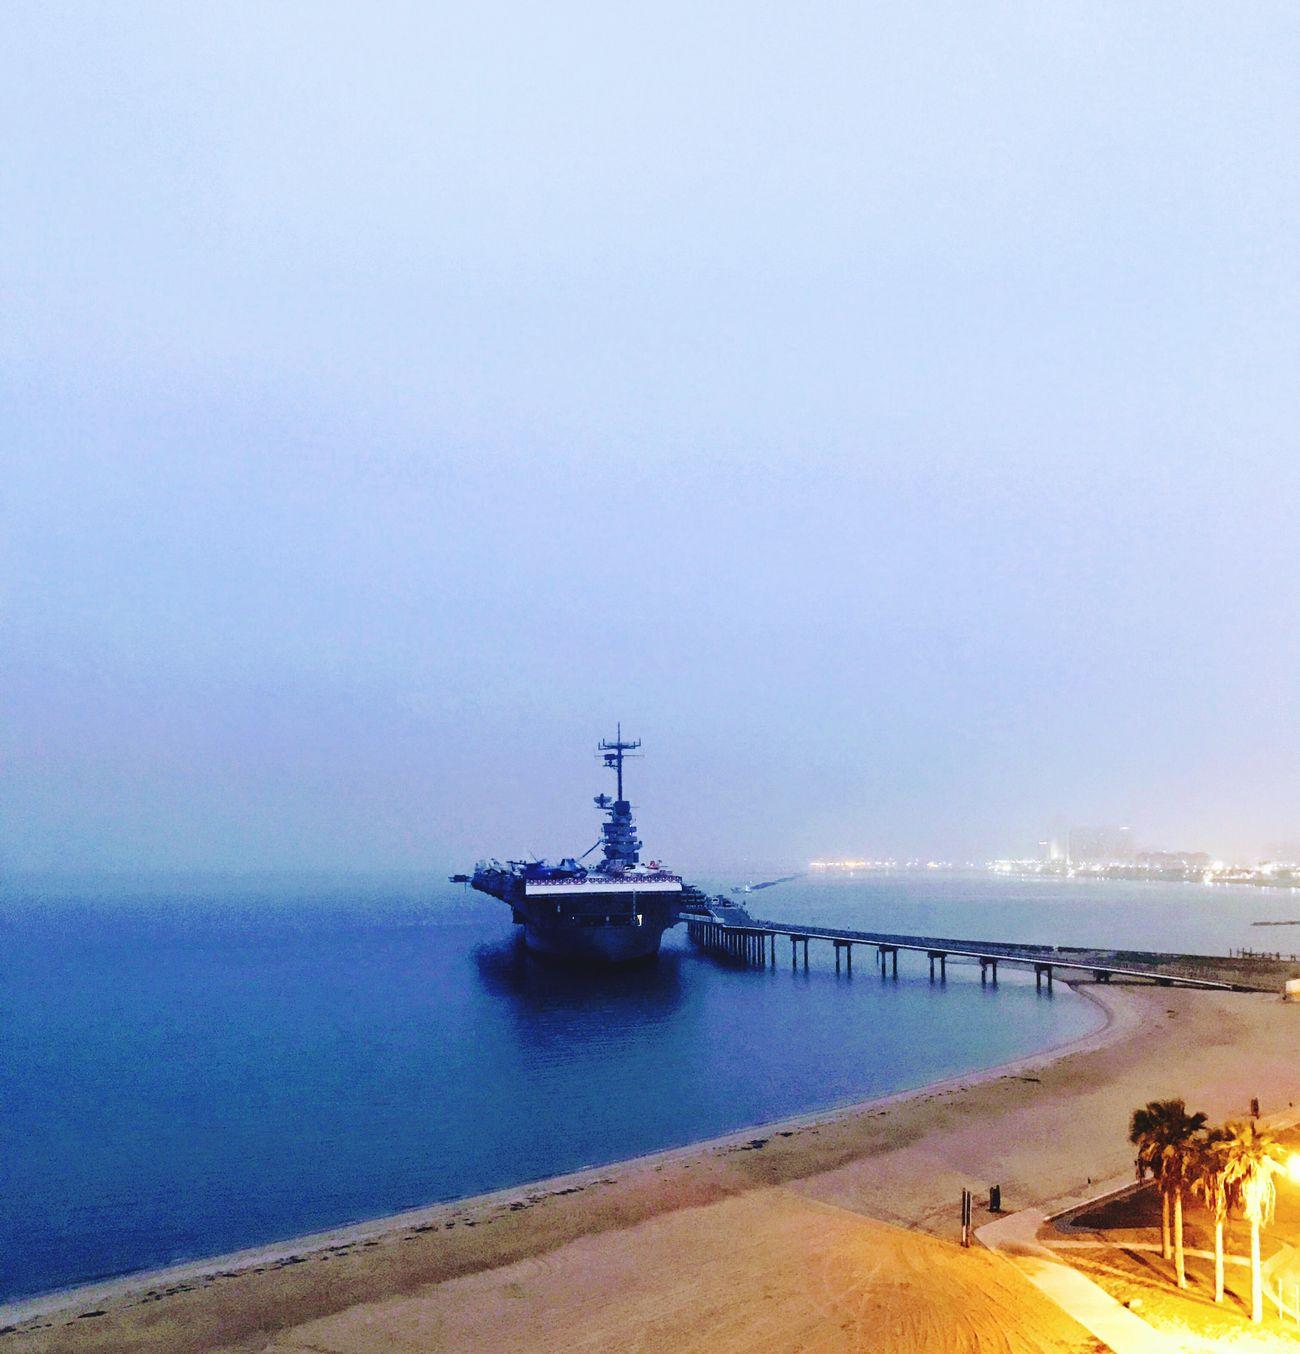 USS Lexington. Sea Nautical Vessel Scenics Beach EyeEmNewInHere